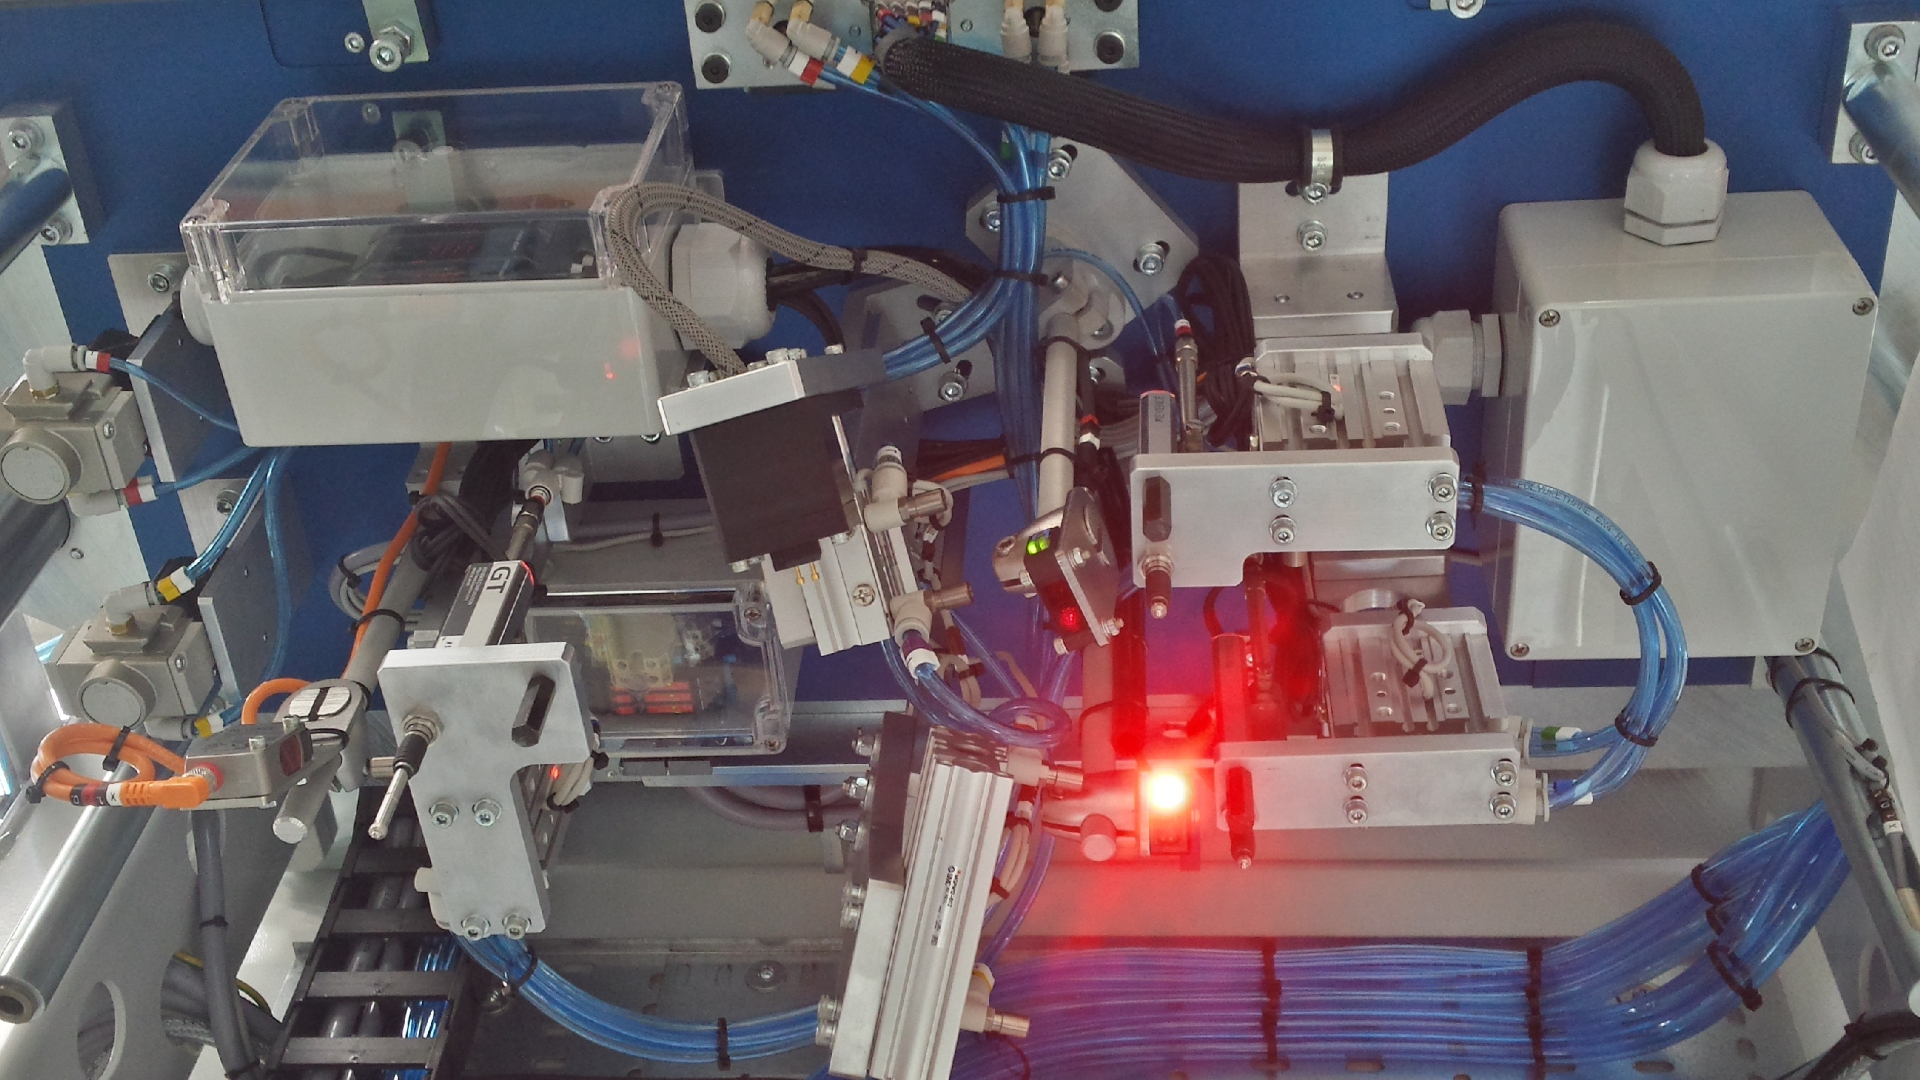 test-bench-assembly-automation